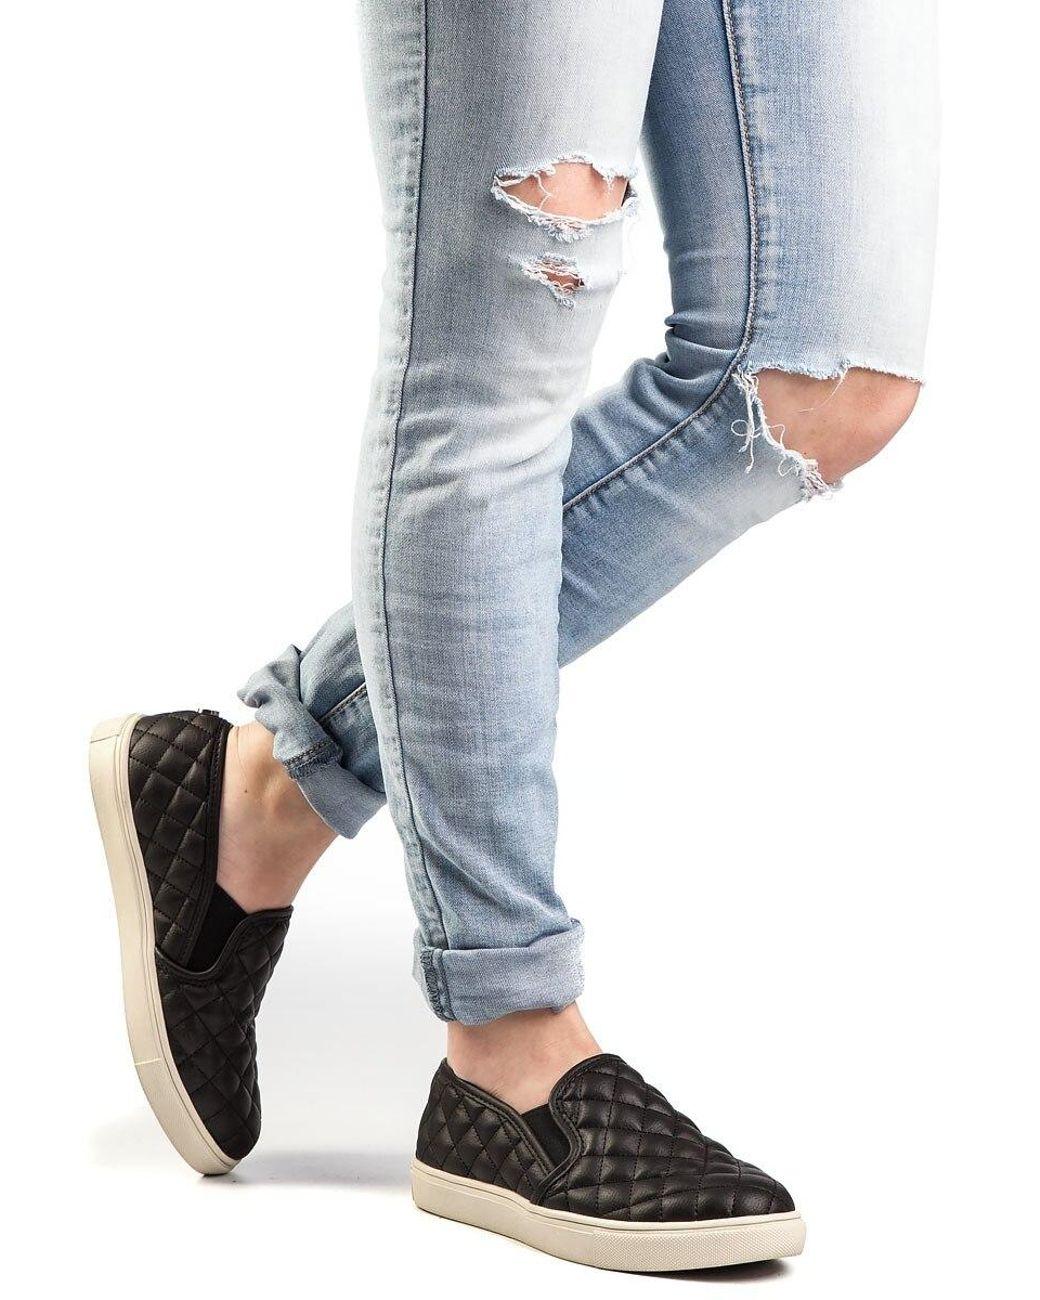 Steve Madden Ecentrcq Sneaker Black